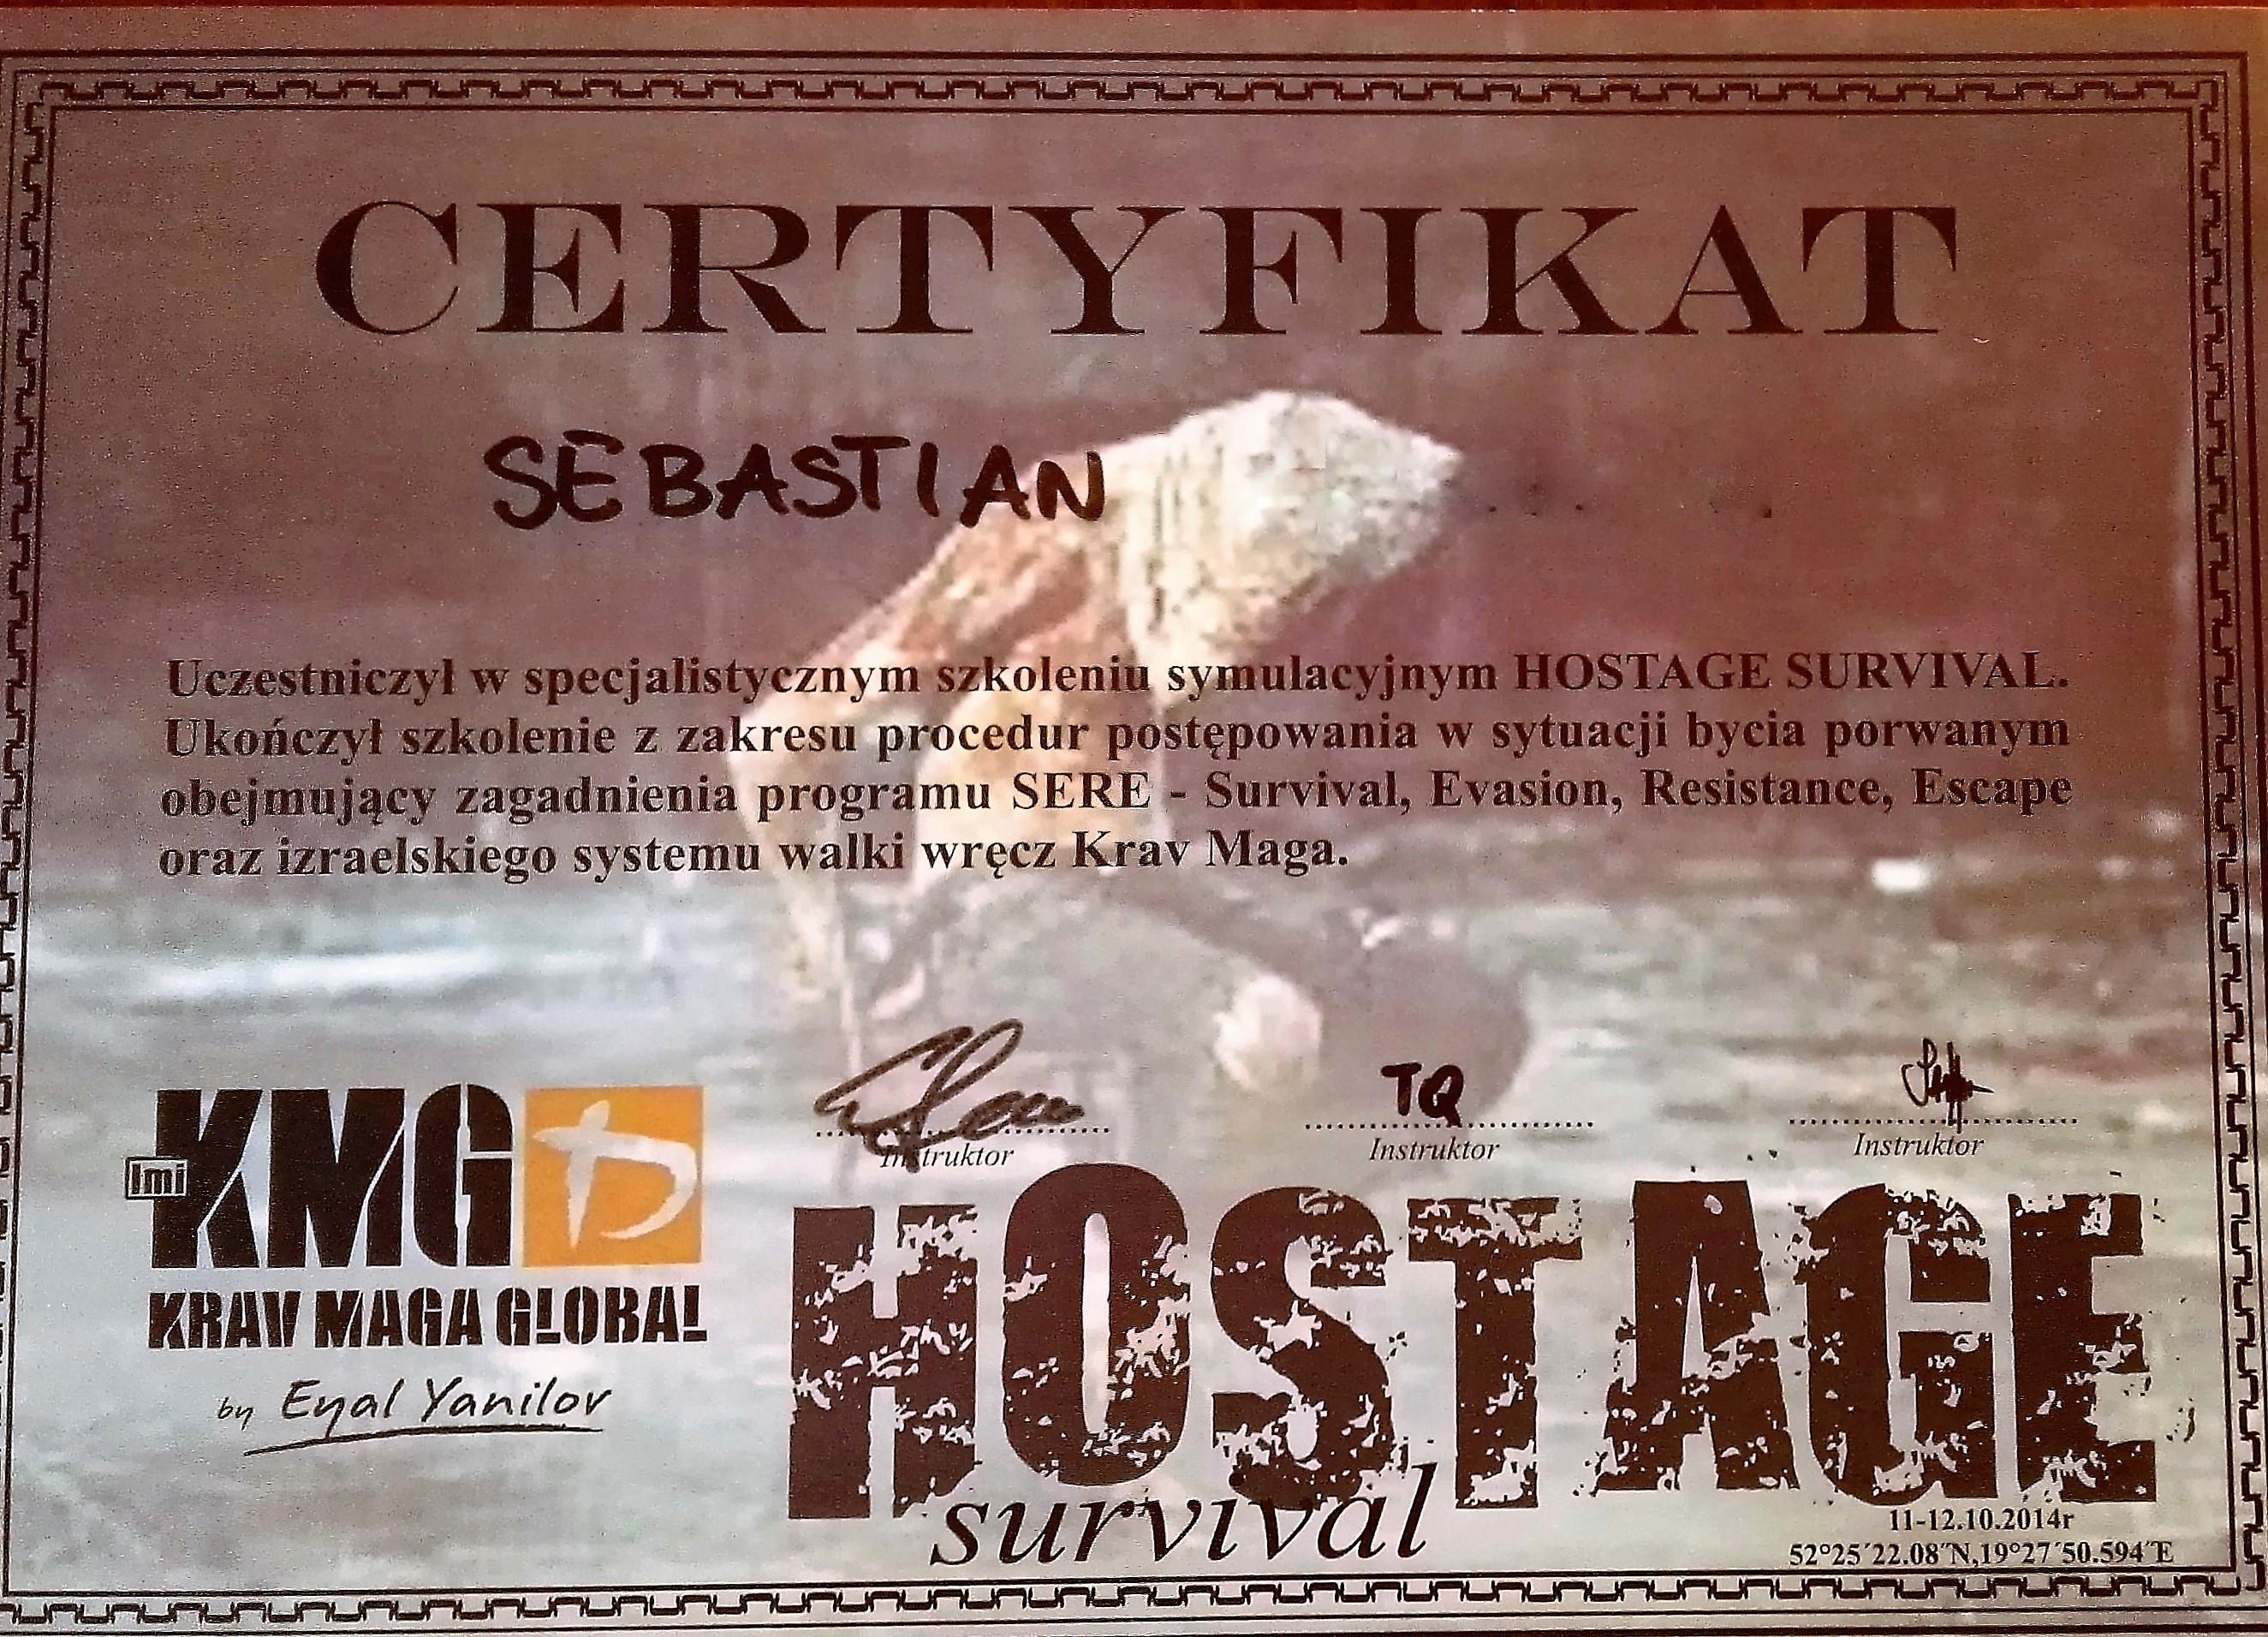 seba hostage wer 2